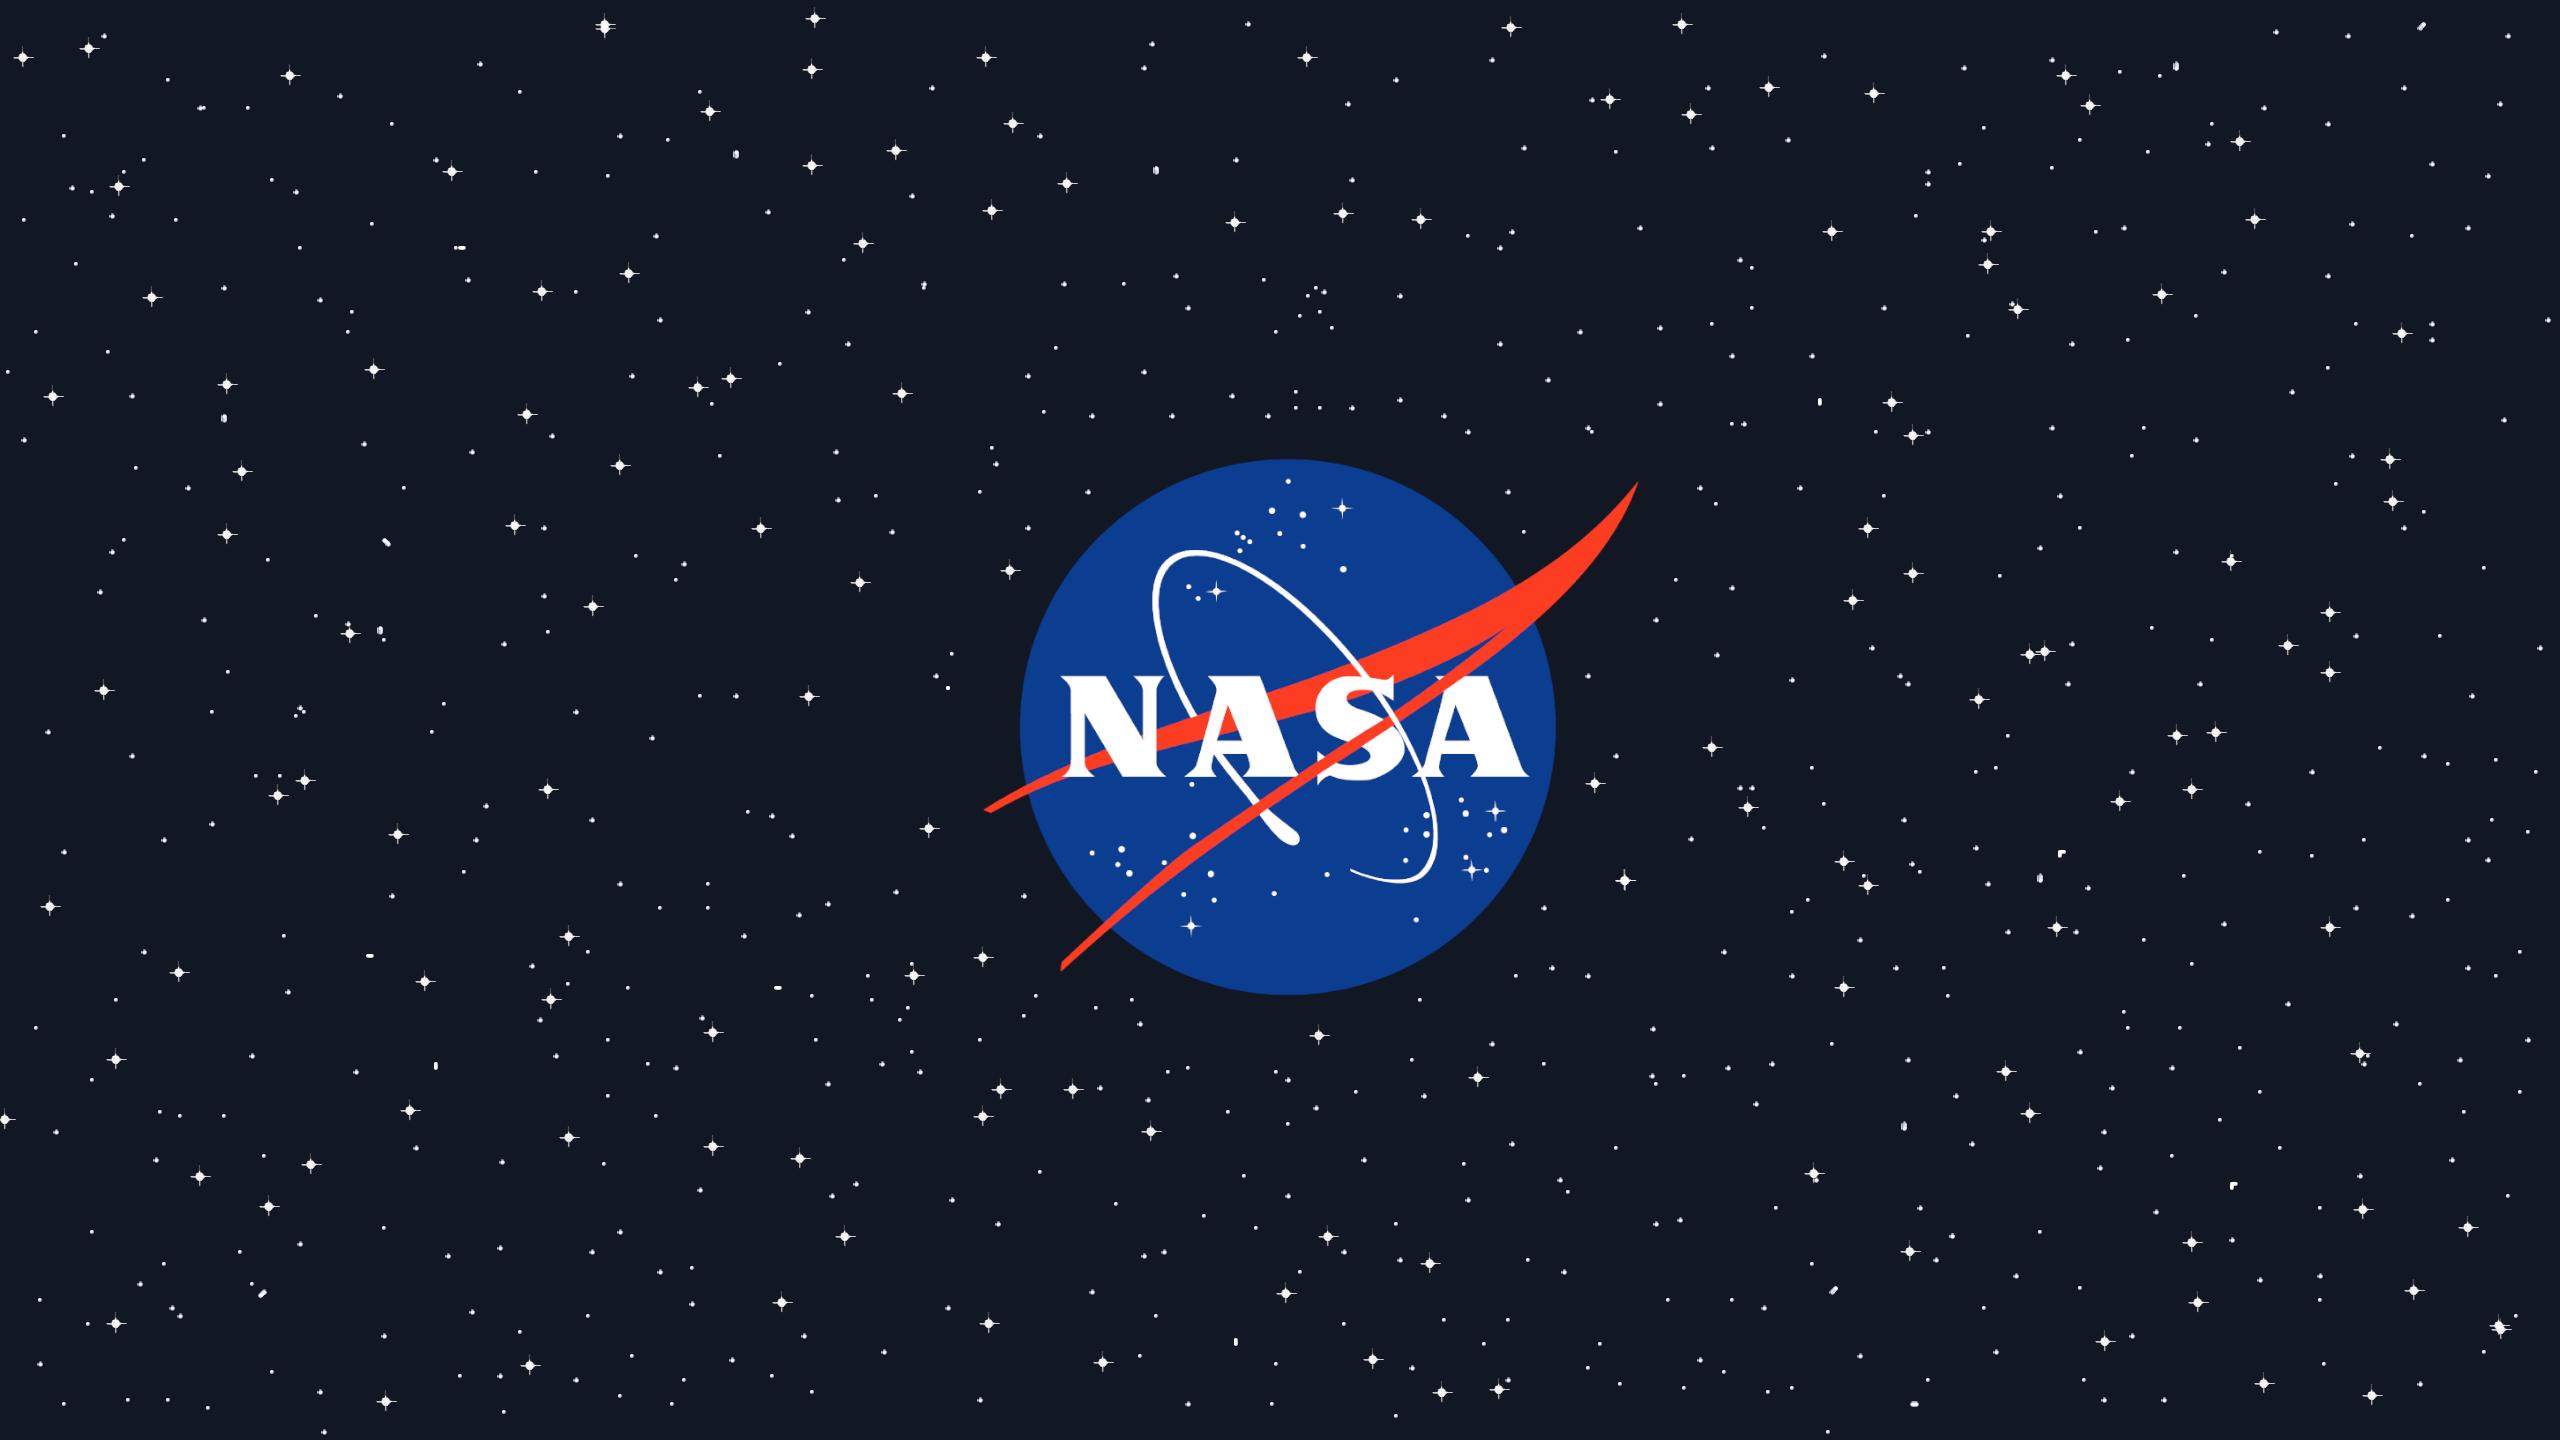 Made a NASA wallpaper. Hope you guys like it. [2560x1440